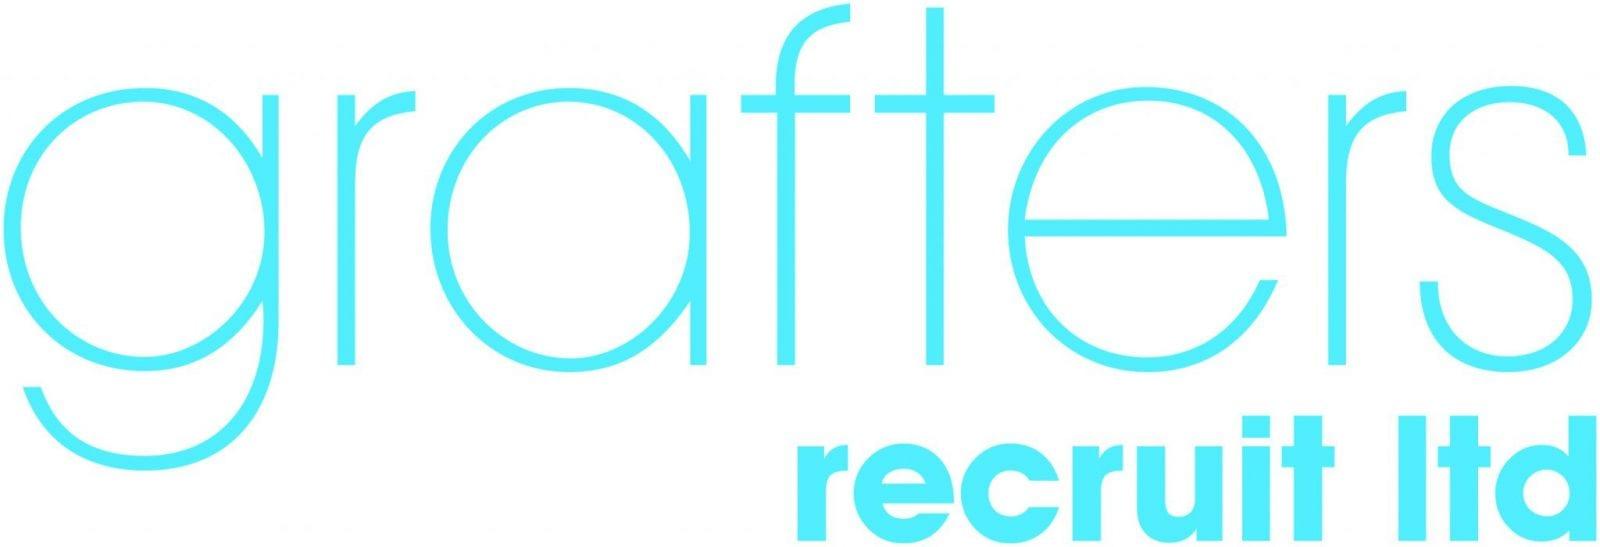 Grafters Recruit Ltd